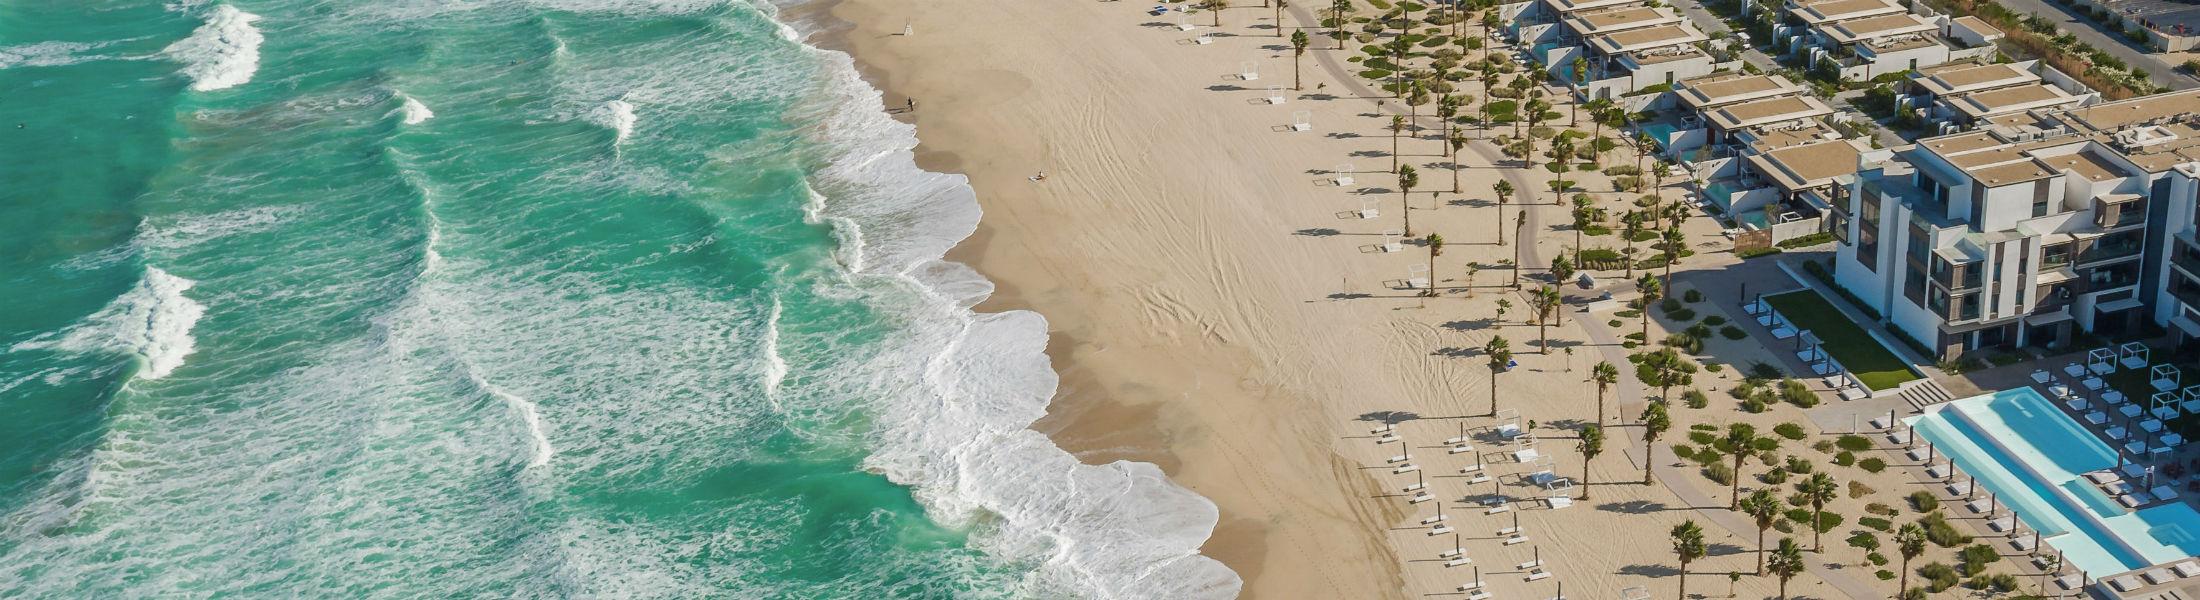 Aerial shot of the Nikki Beach Resort & Spa Dubai